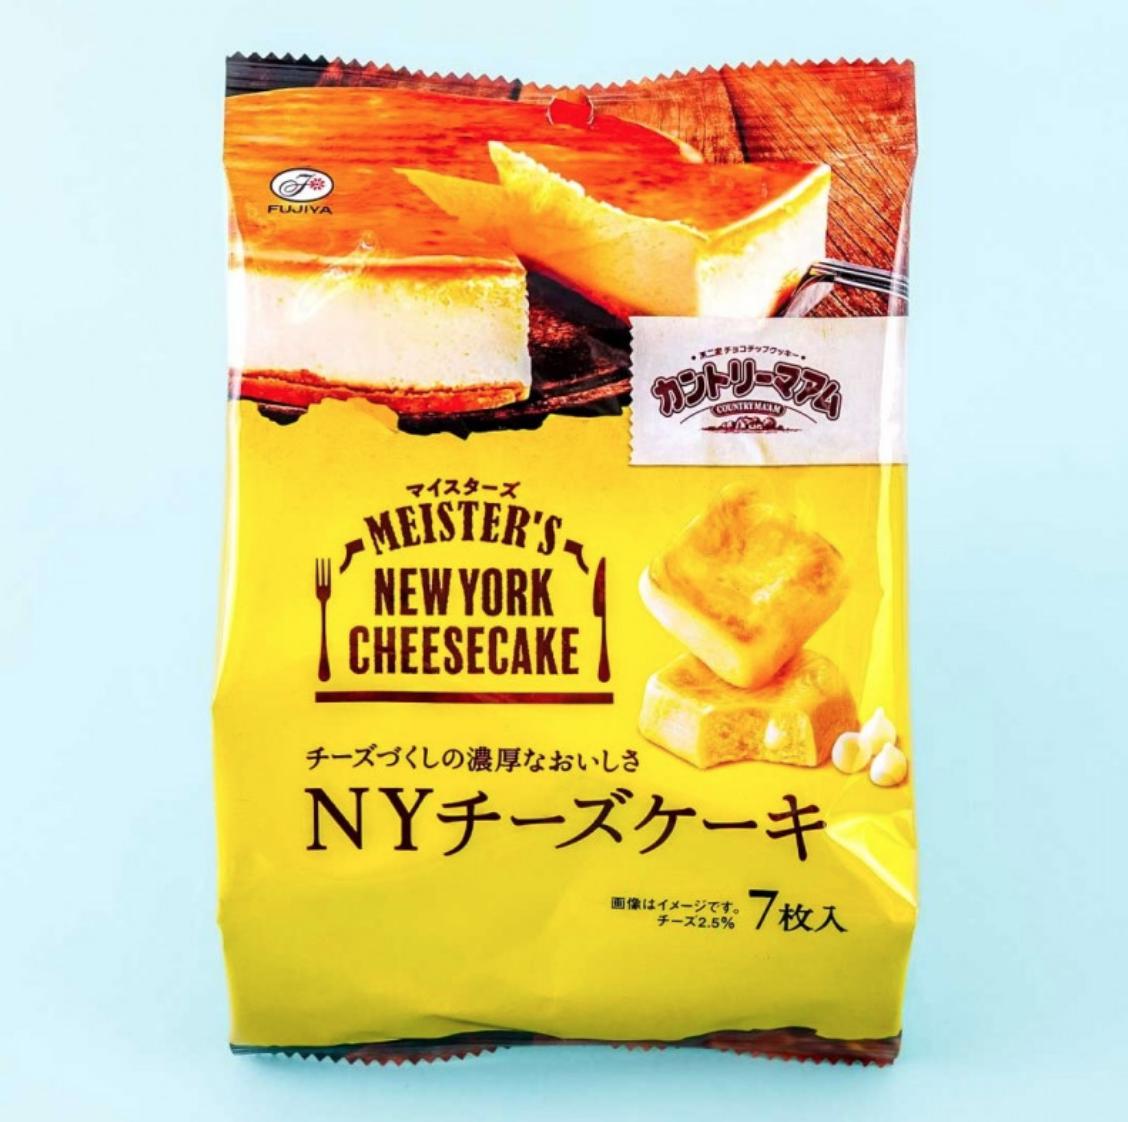 Fujiya Fujiya Country Ma'am Cookies (NY Cheesecake Flavor)